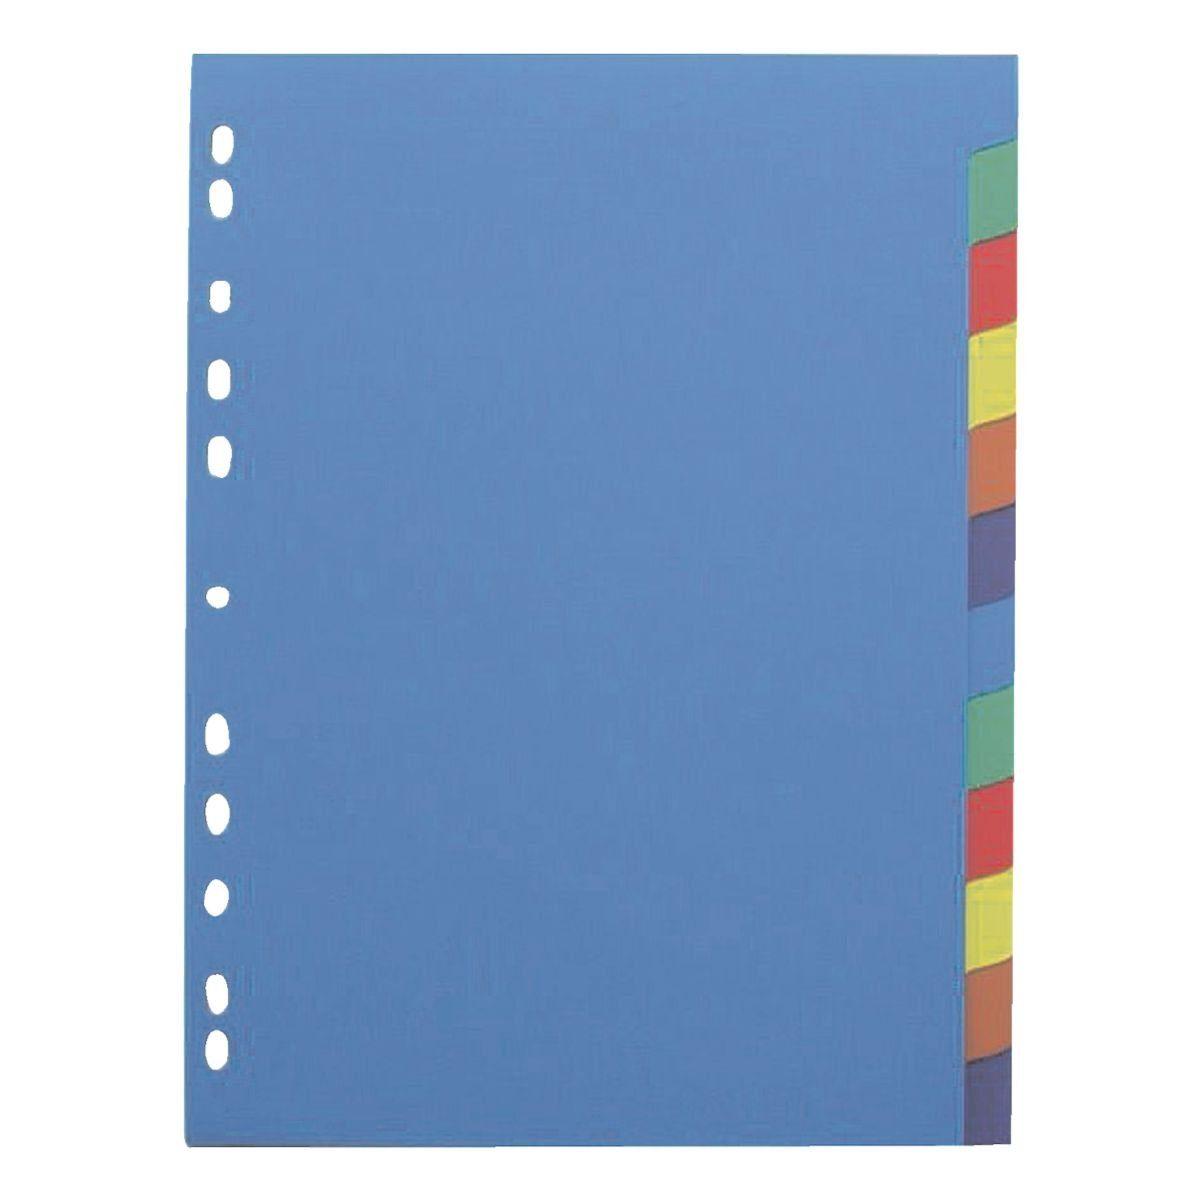 OTTO_OFFICE_PREMIUM Kunststoffregister 12-teilig blanko A4 blau/farbig